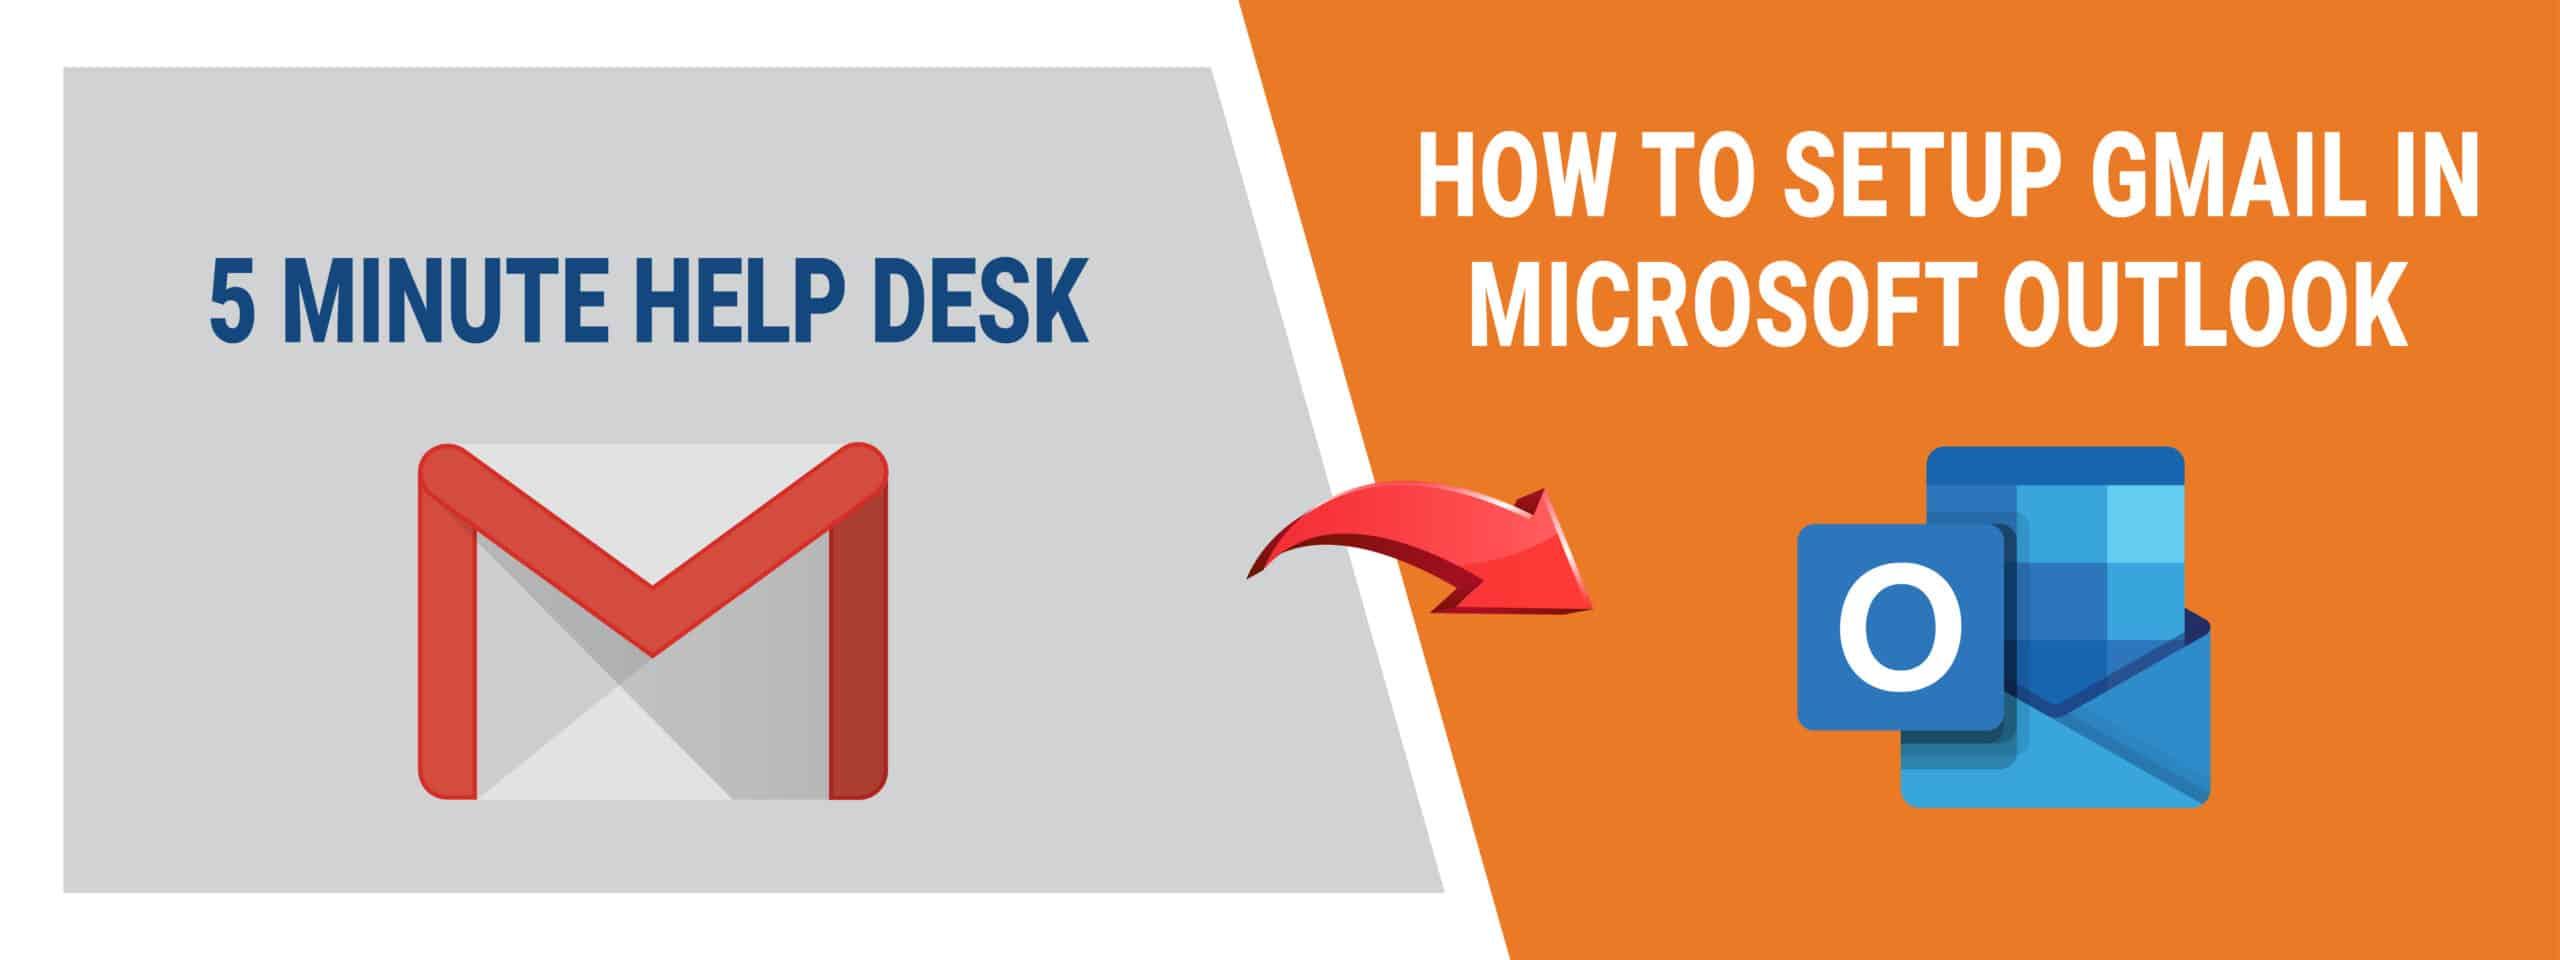 How do I setup gmail in Microsoft Outlook   5 Minute Help Desk